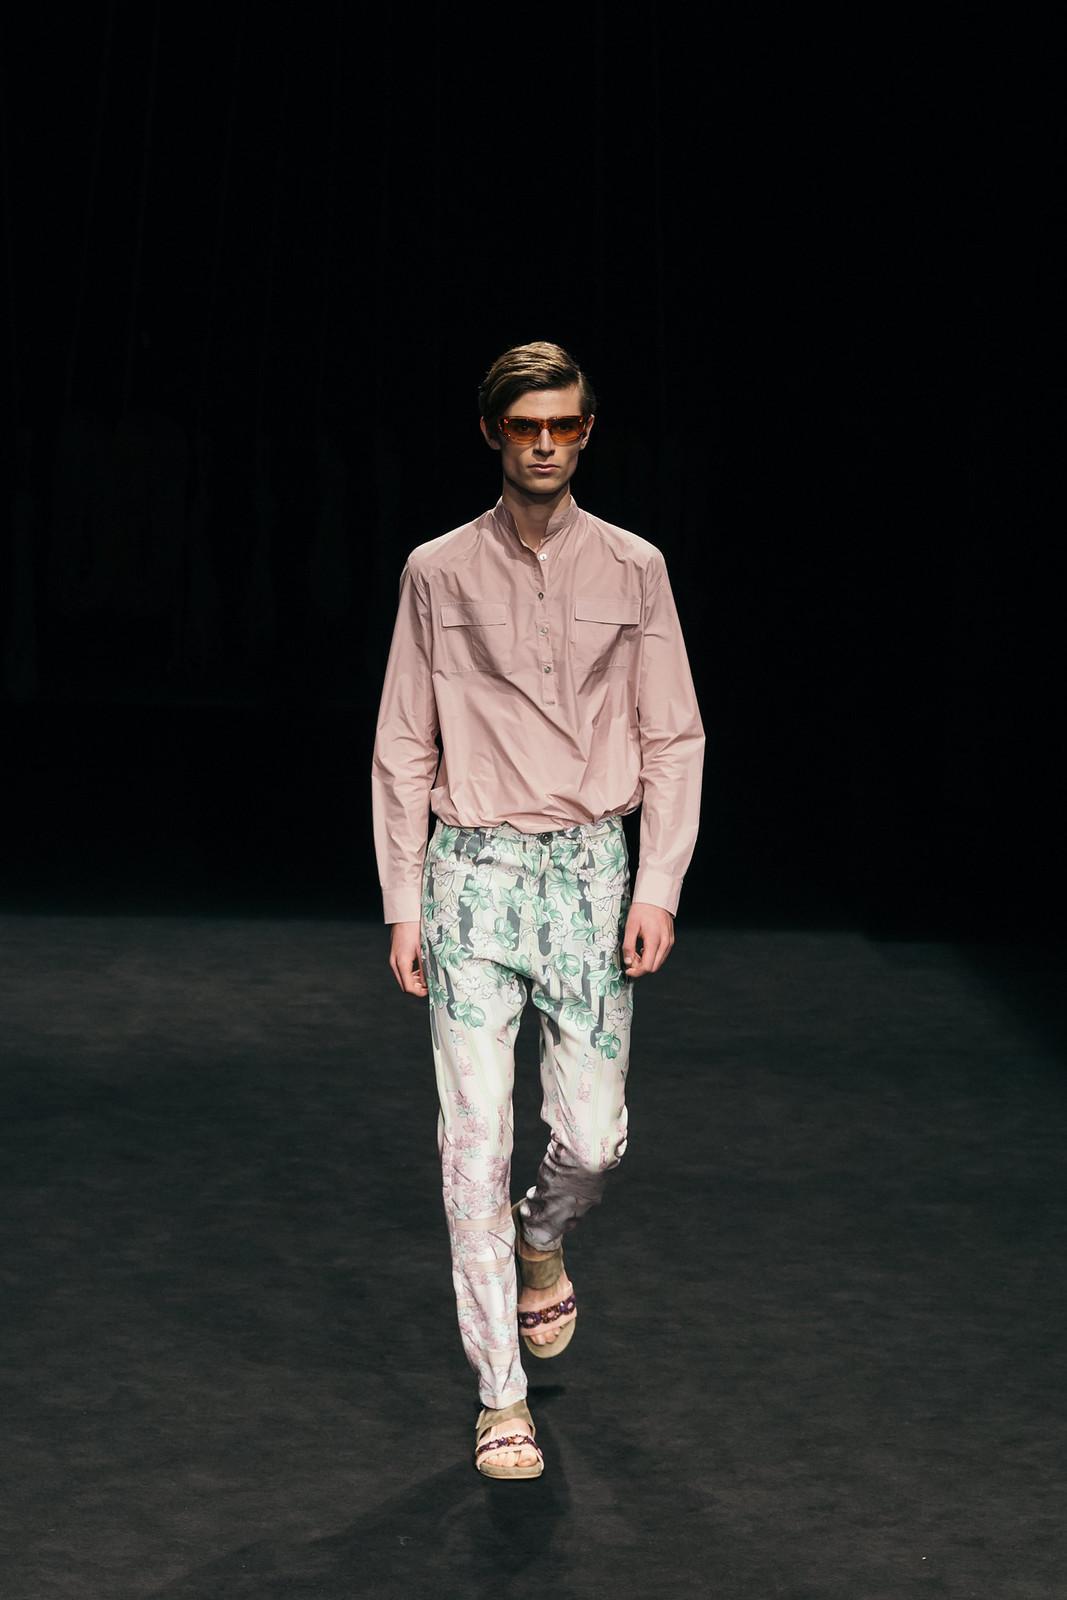 Jessie Chanes - Seams for a desire - 080 Bacelona Fashion #080bcnfasion -4